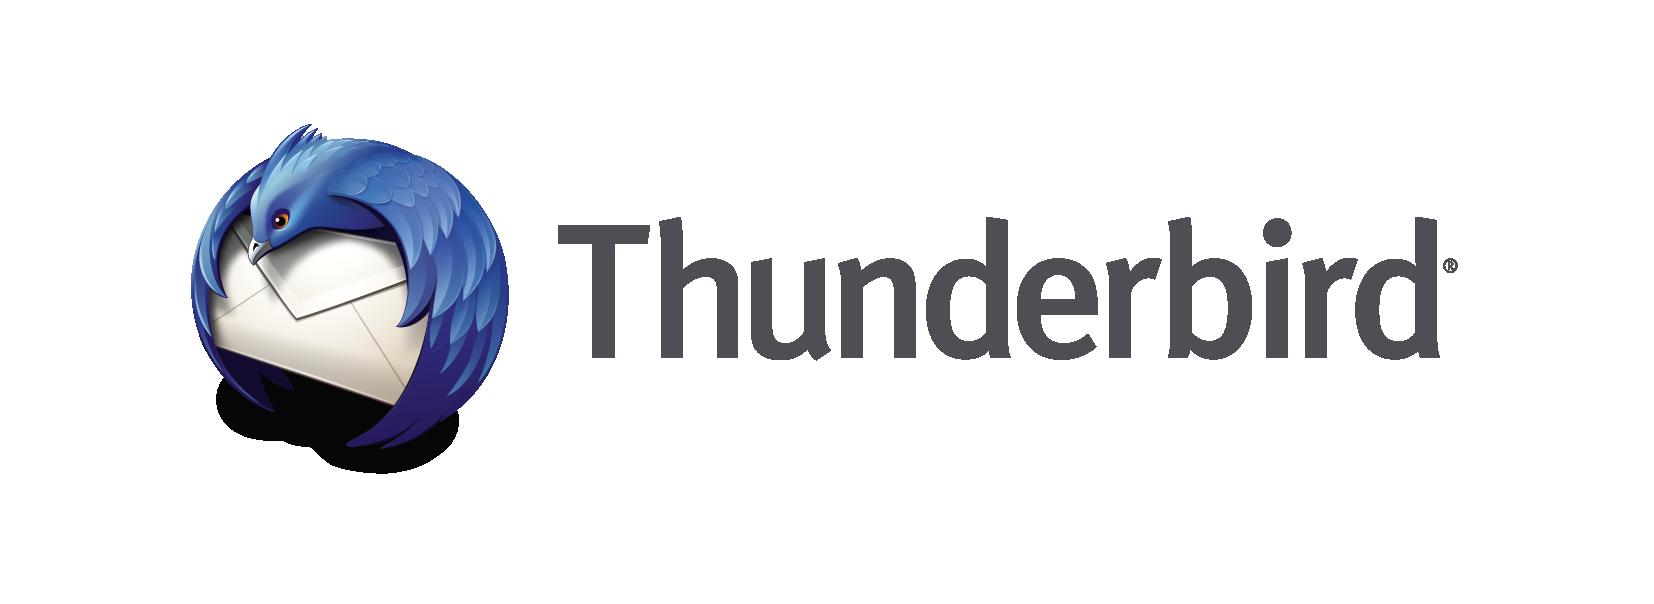 Thunderbirdサンダーバードの設定方法と使い方を解説!